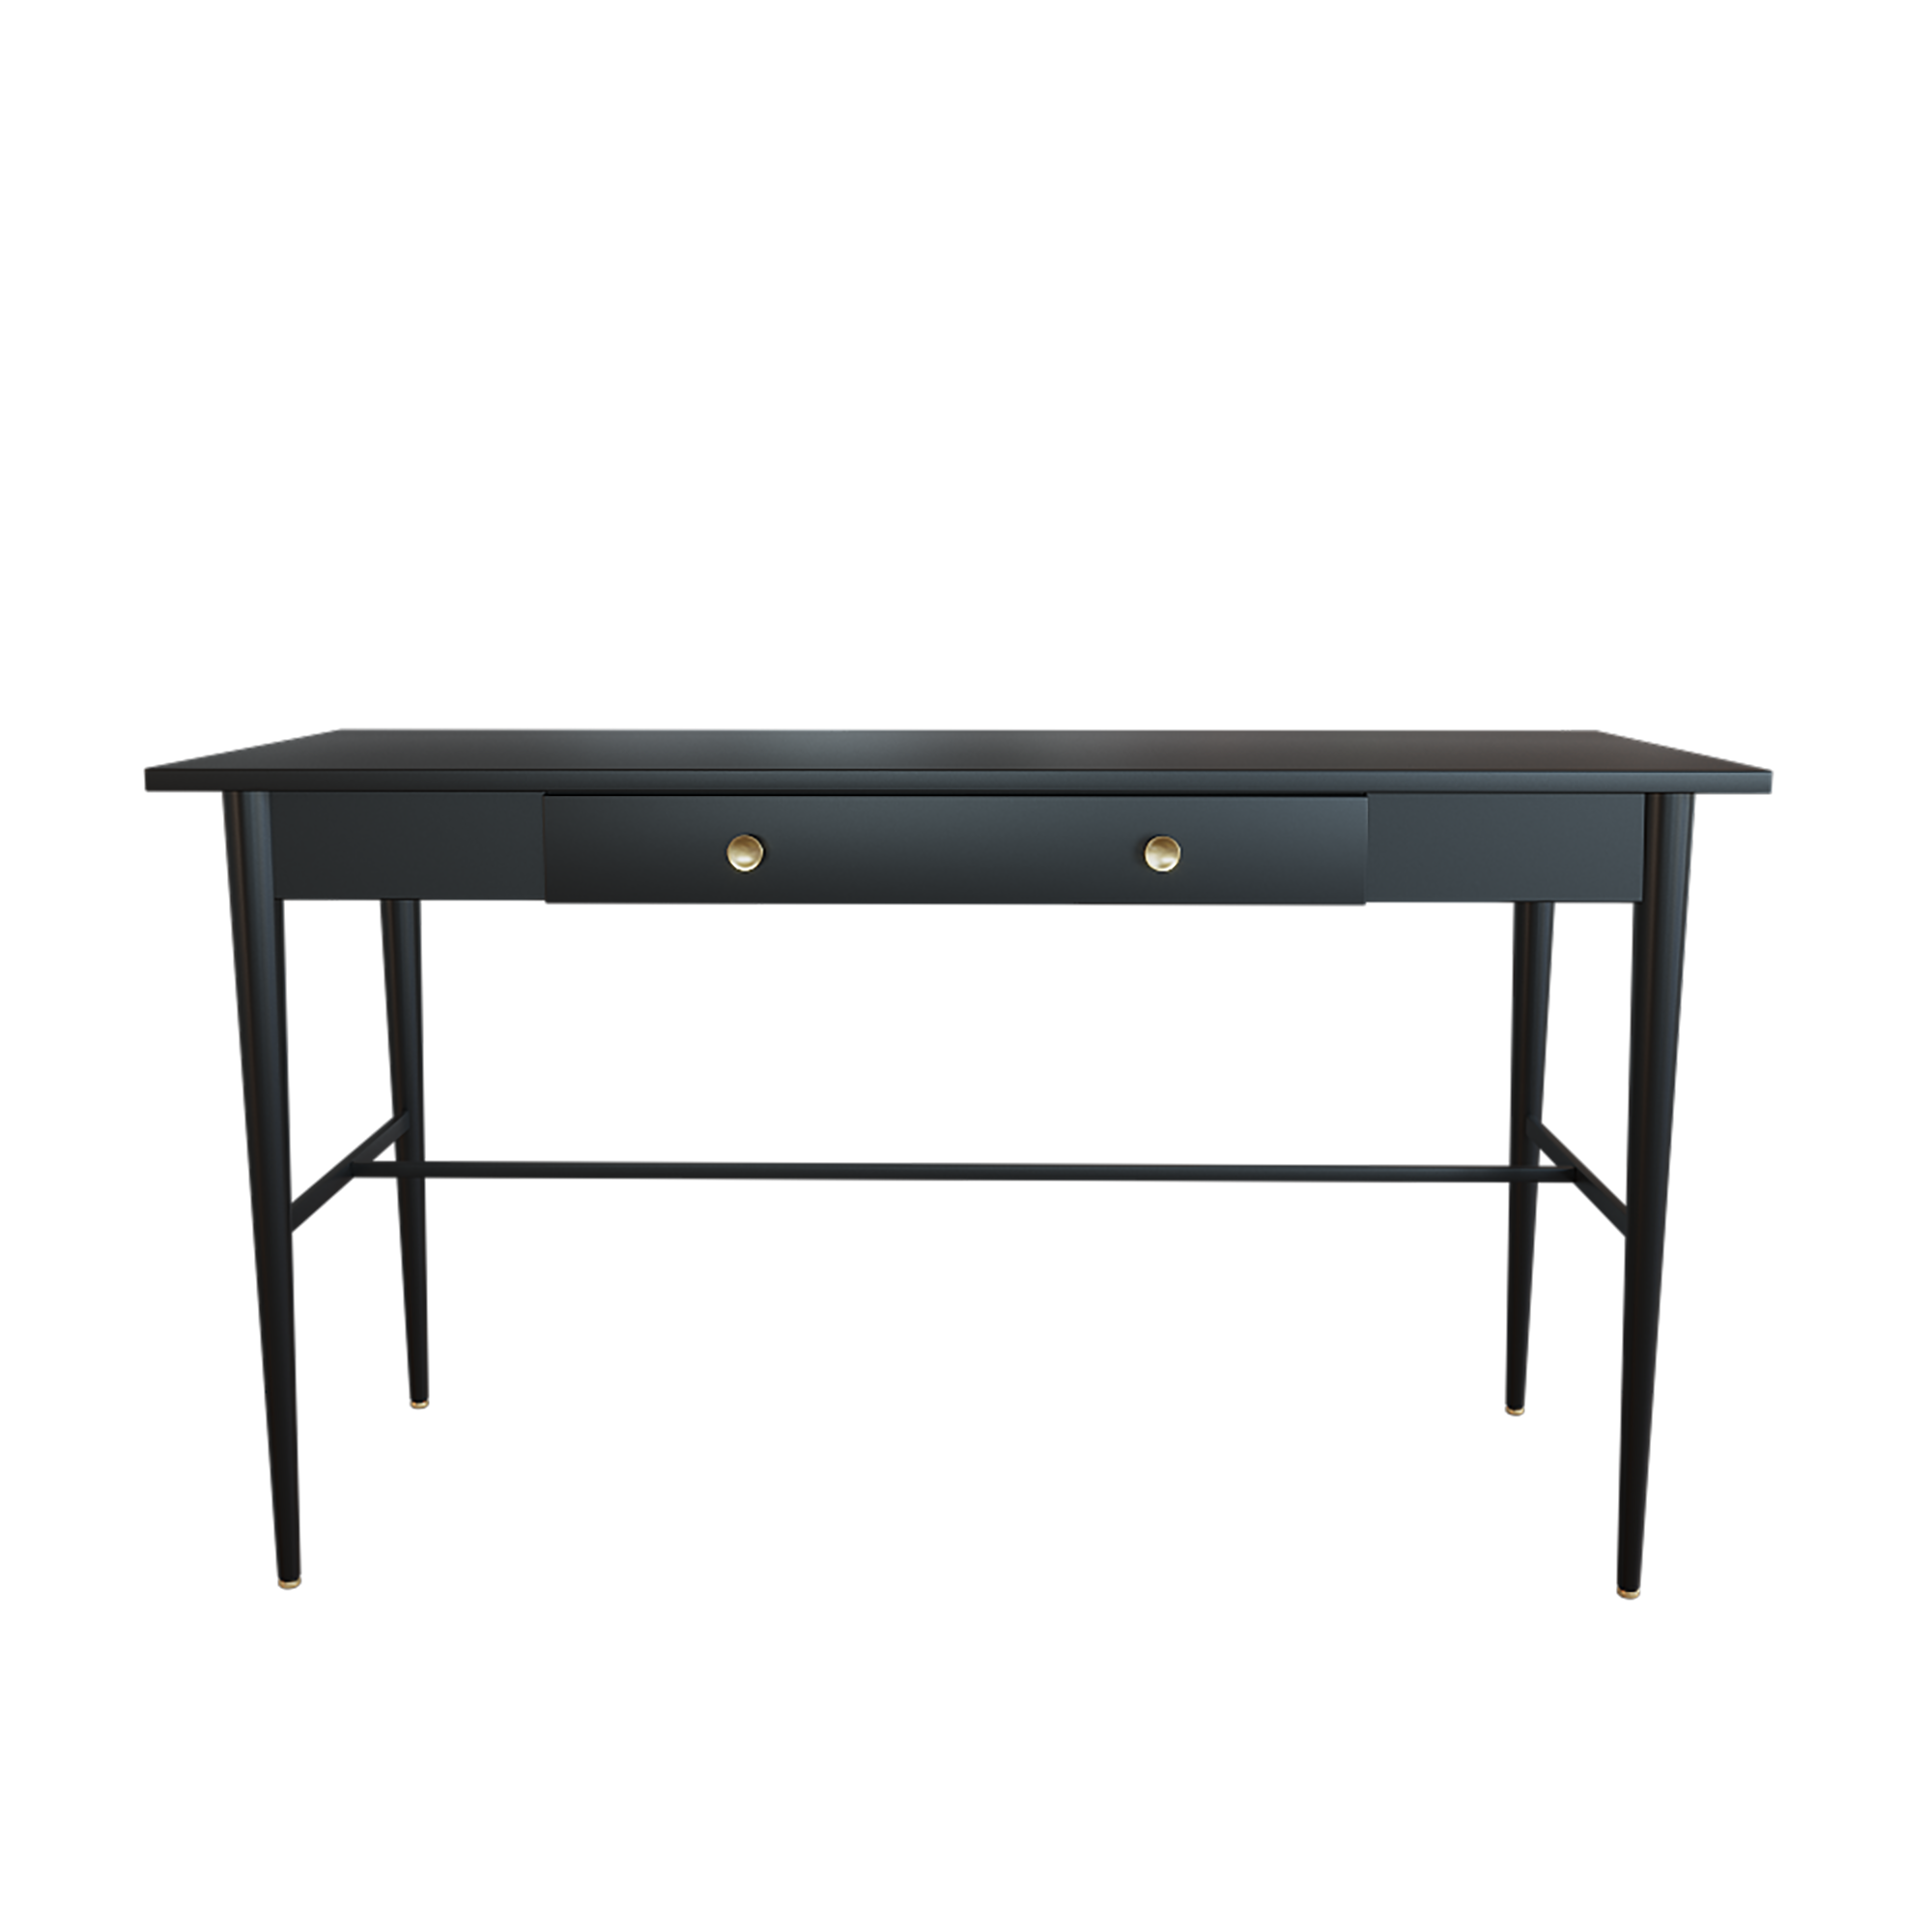 Письменный стол Any-Home P006 - P006 | AnyHome.ru